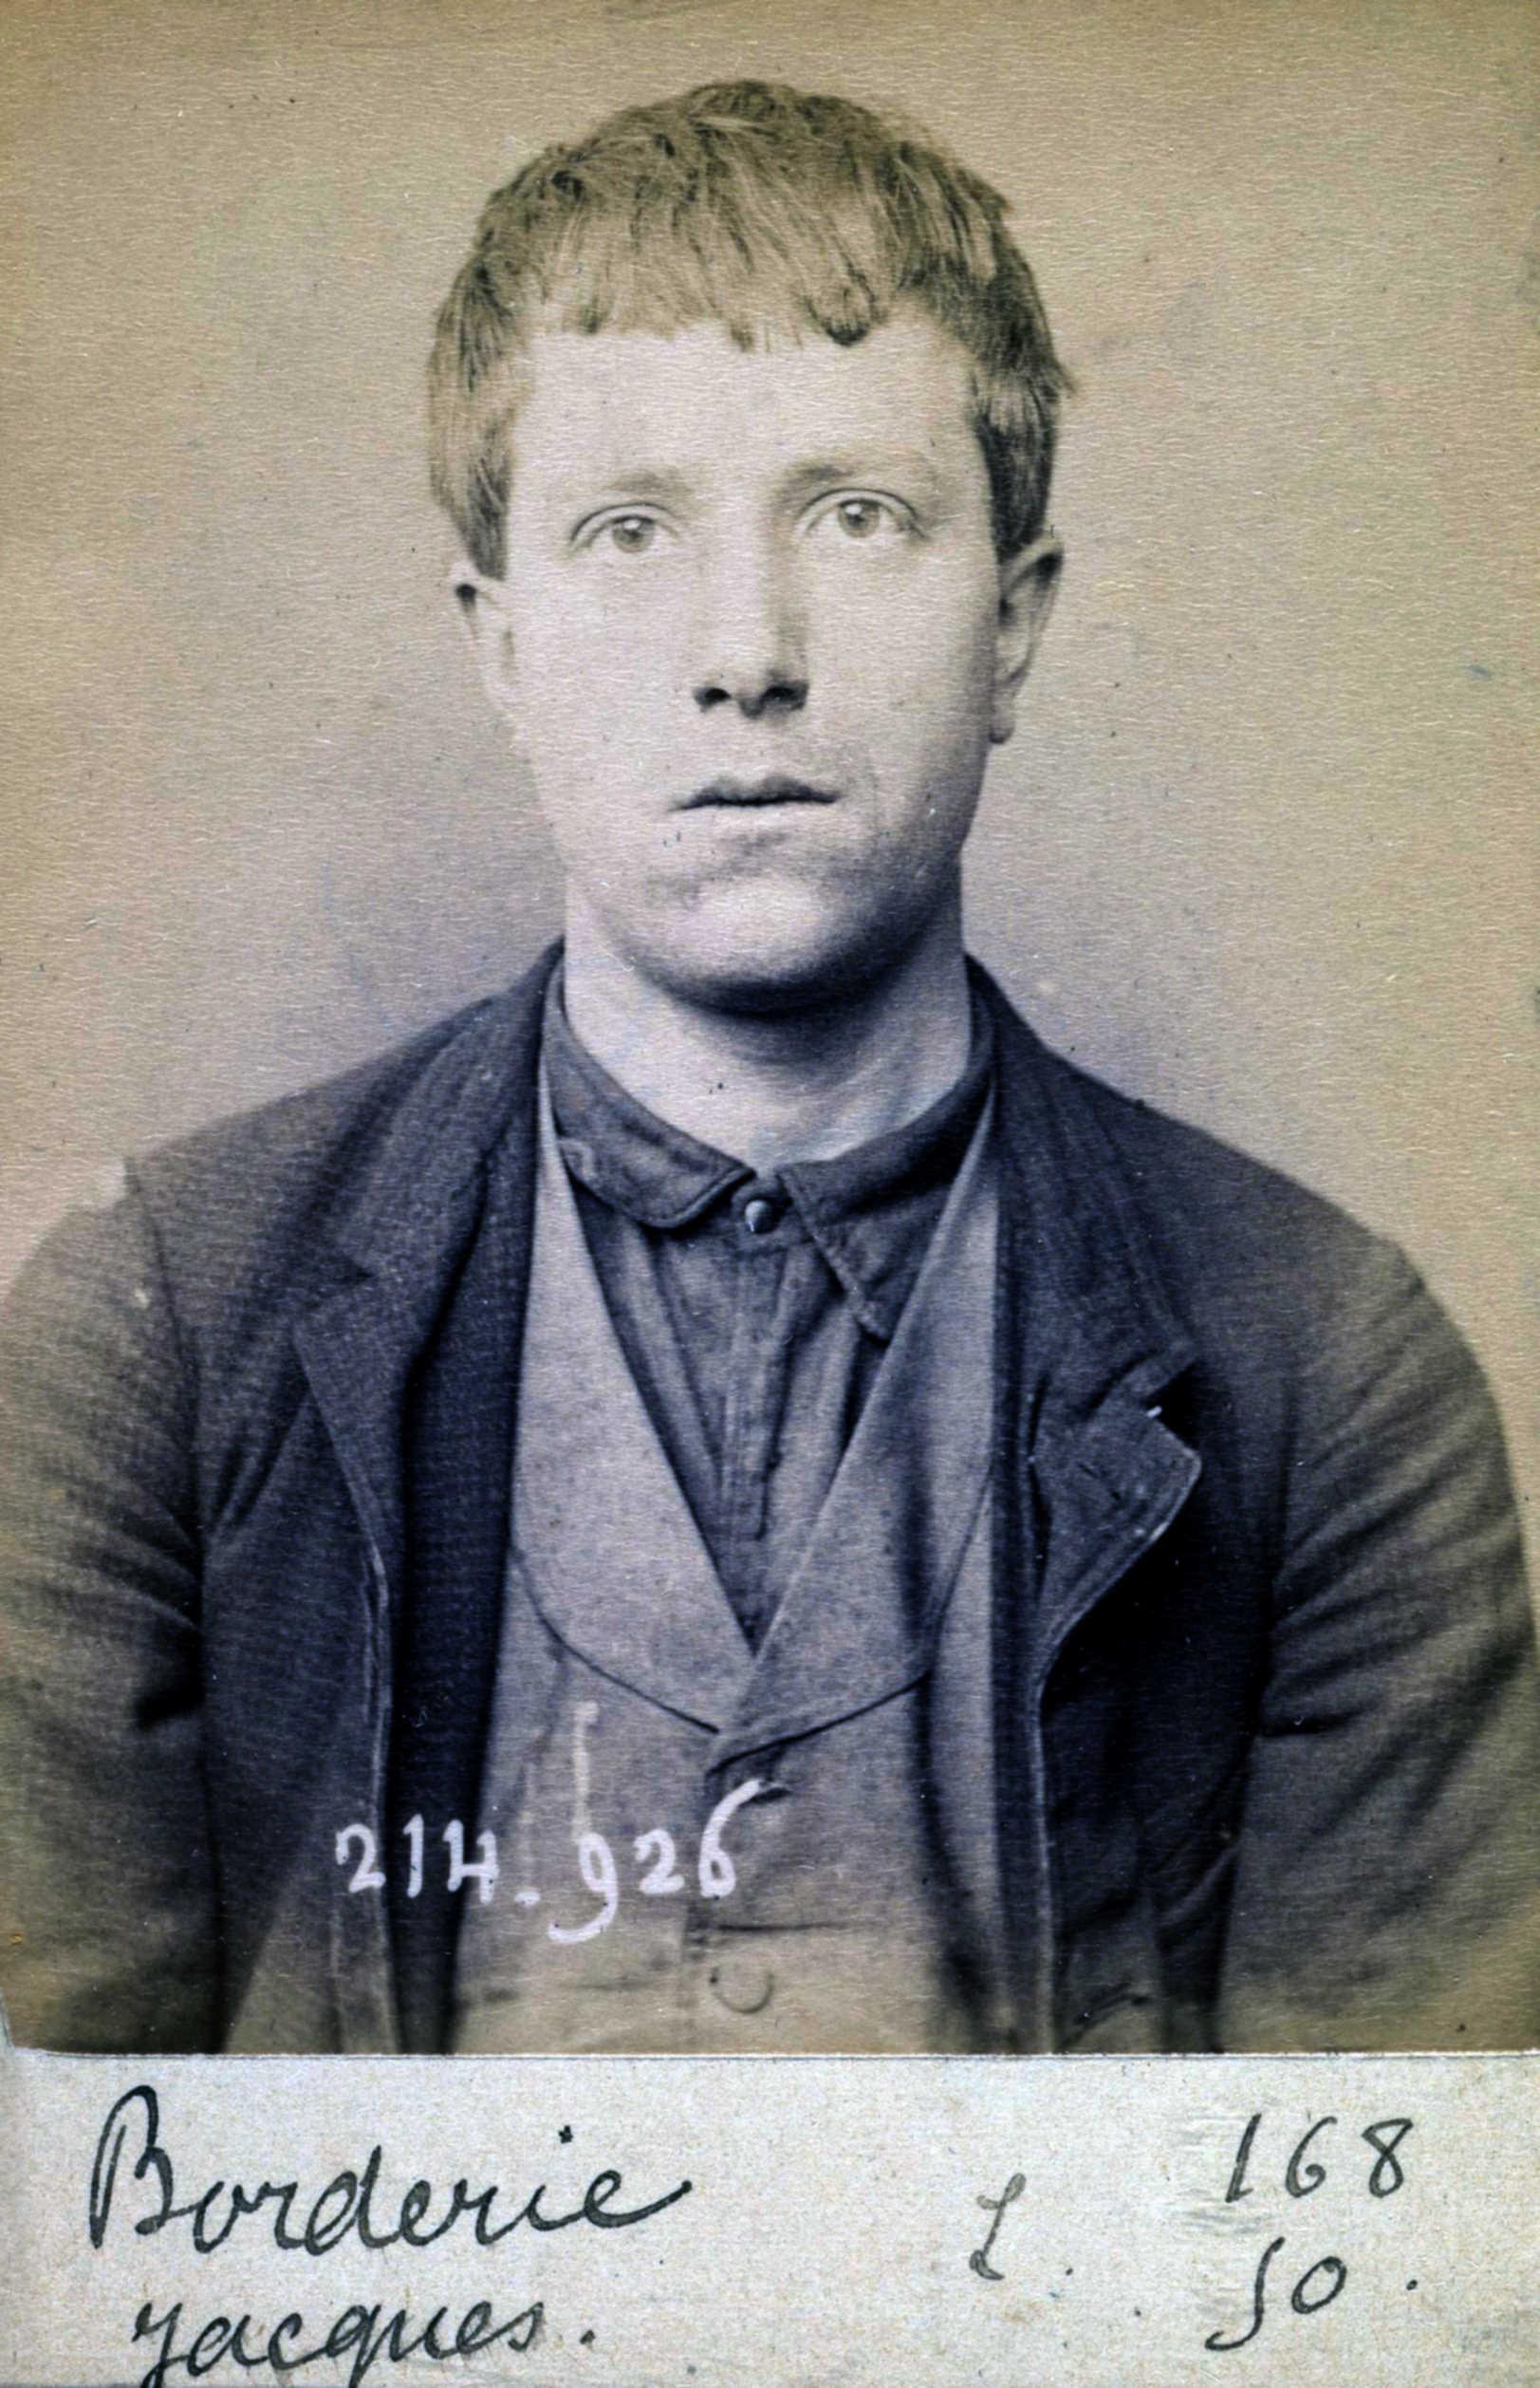 Foto policíaca de Jacques Borderie (1 de març de 1894)